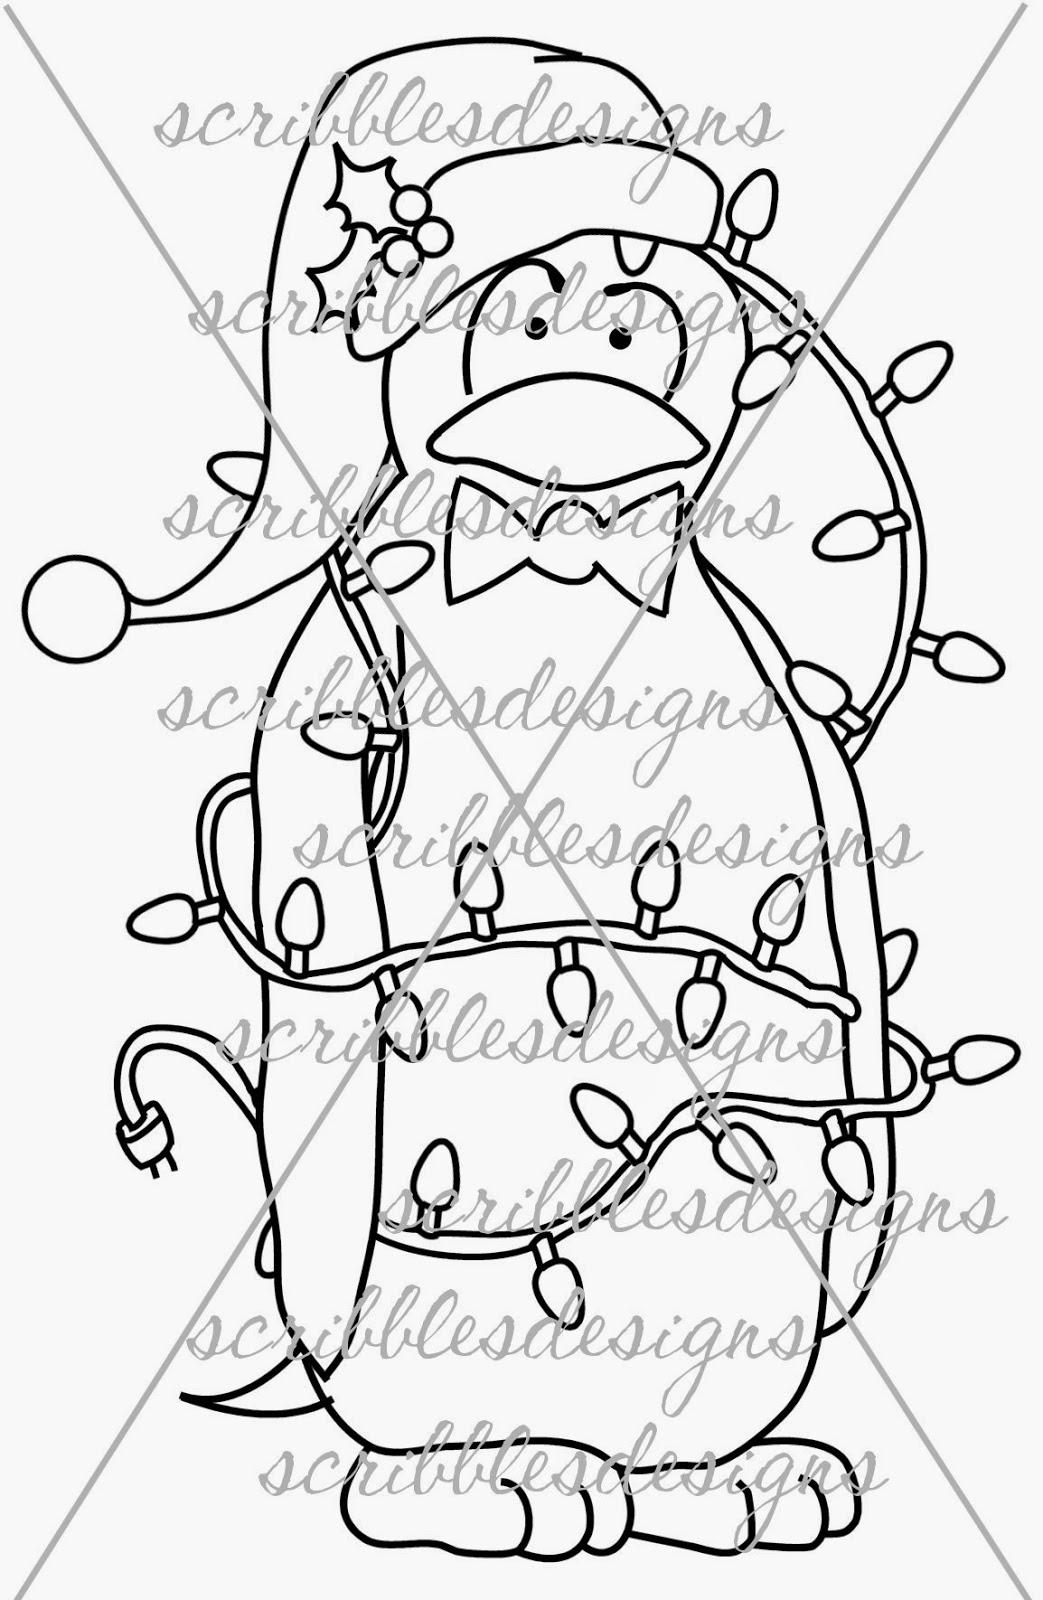 http://buyscribblesdesigns.blogspot.ca/2013/10/228-twinkle-brrr-300.html